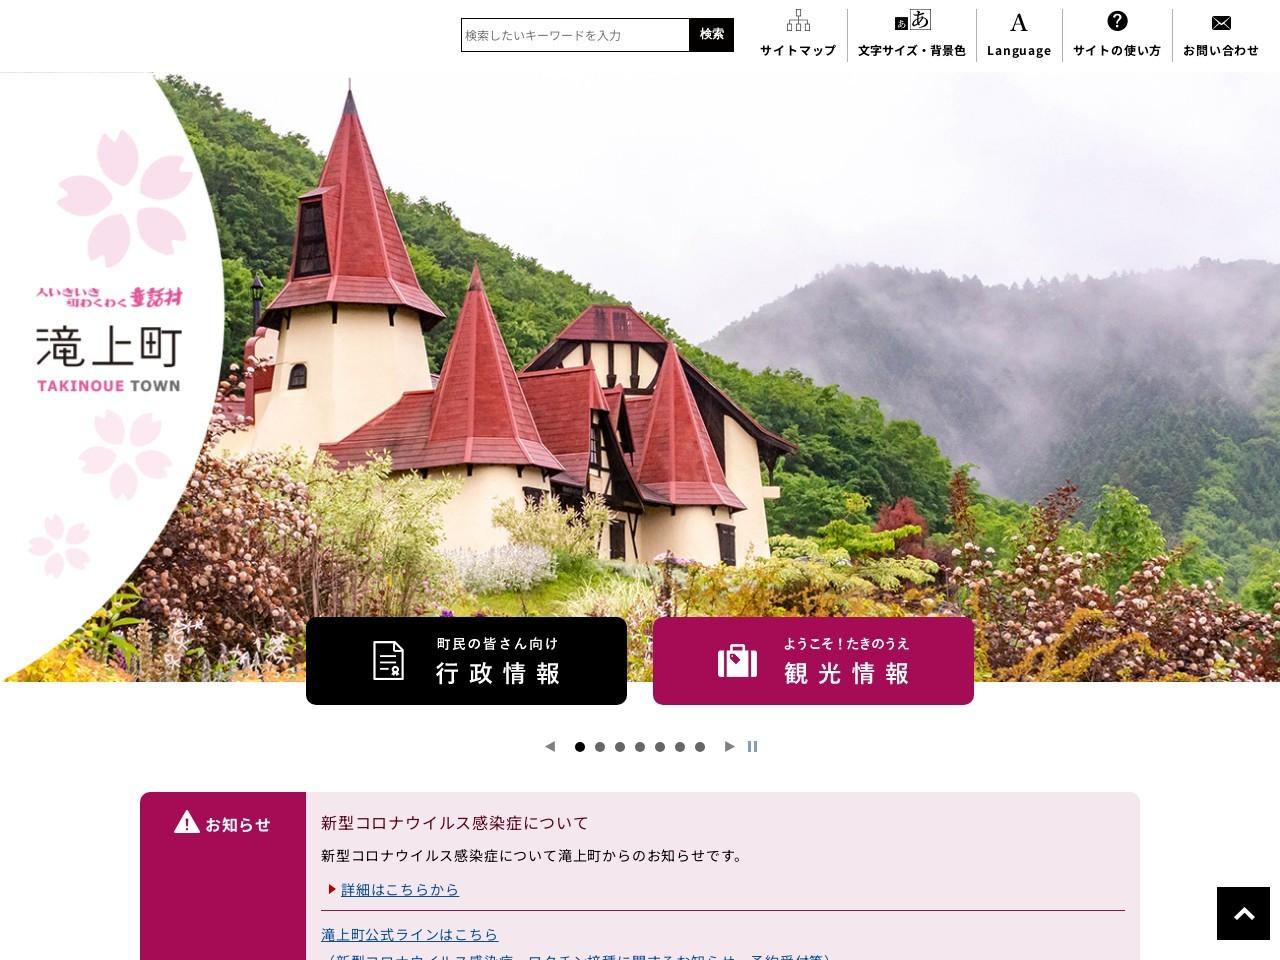 http://town.takinoue.hokkaido.jp/chosei/oshirase/sokei6-public-comment2.html